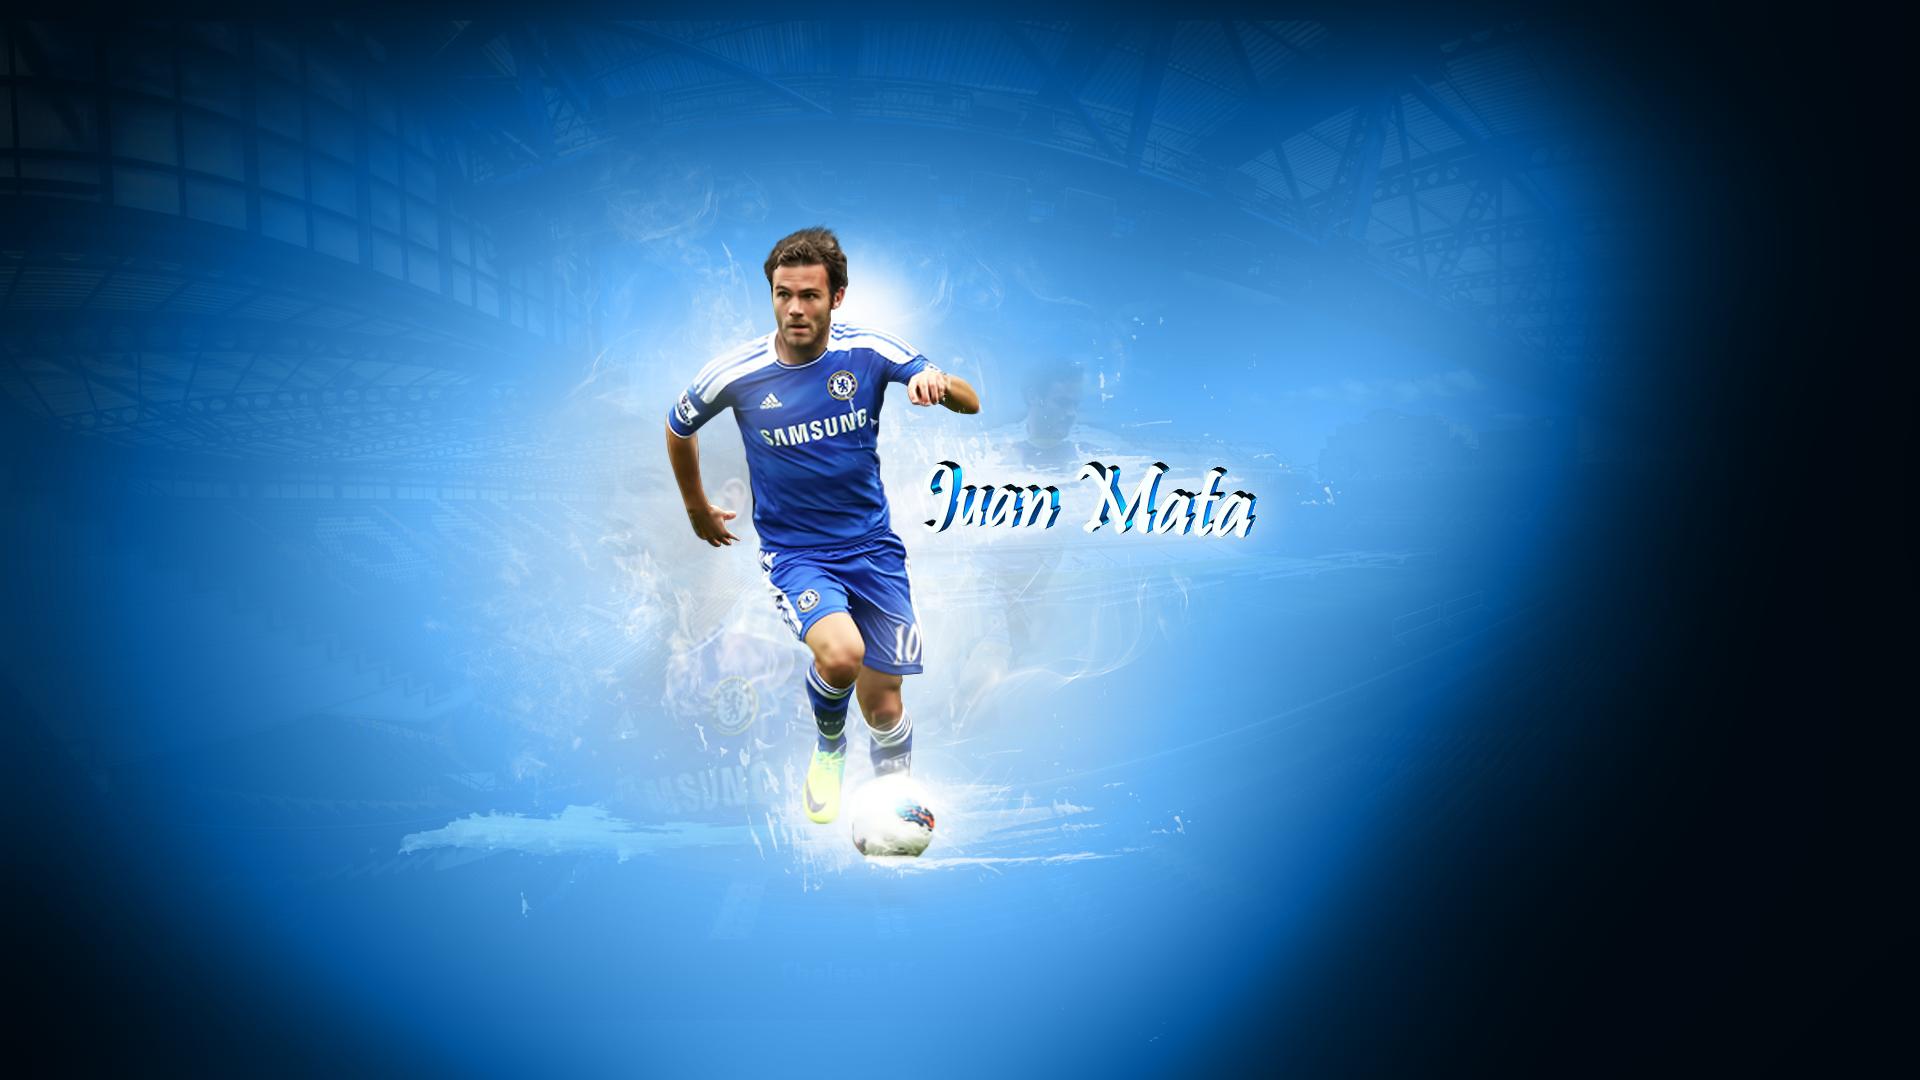 Juan Mata Chelsea by lubiga on DeviantArt